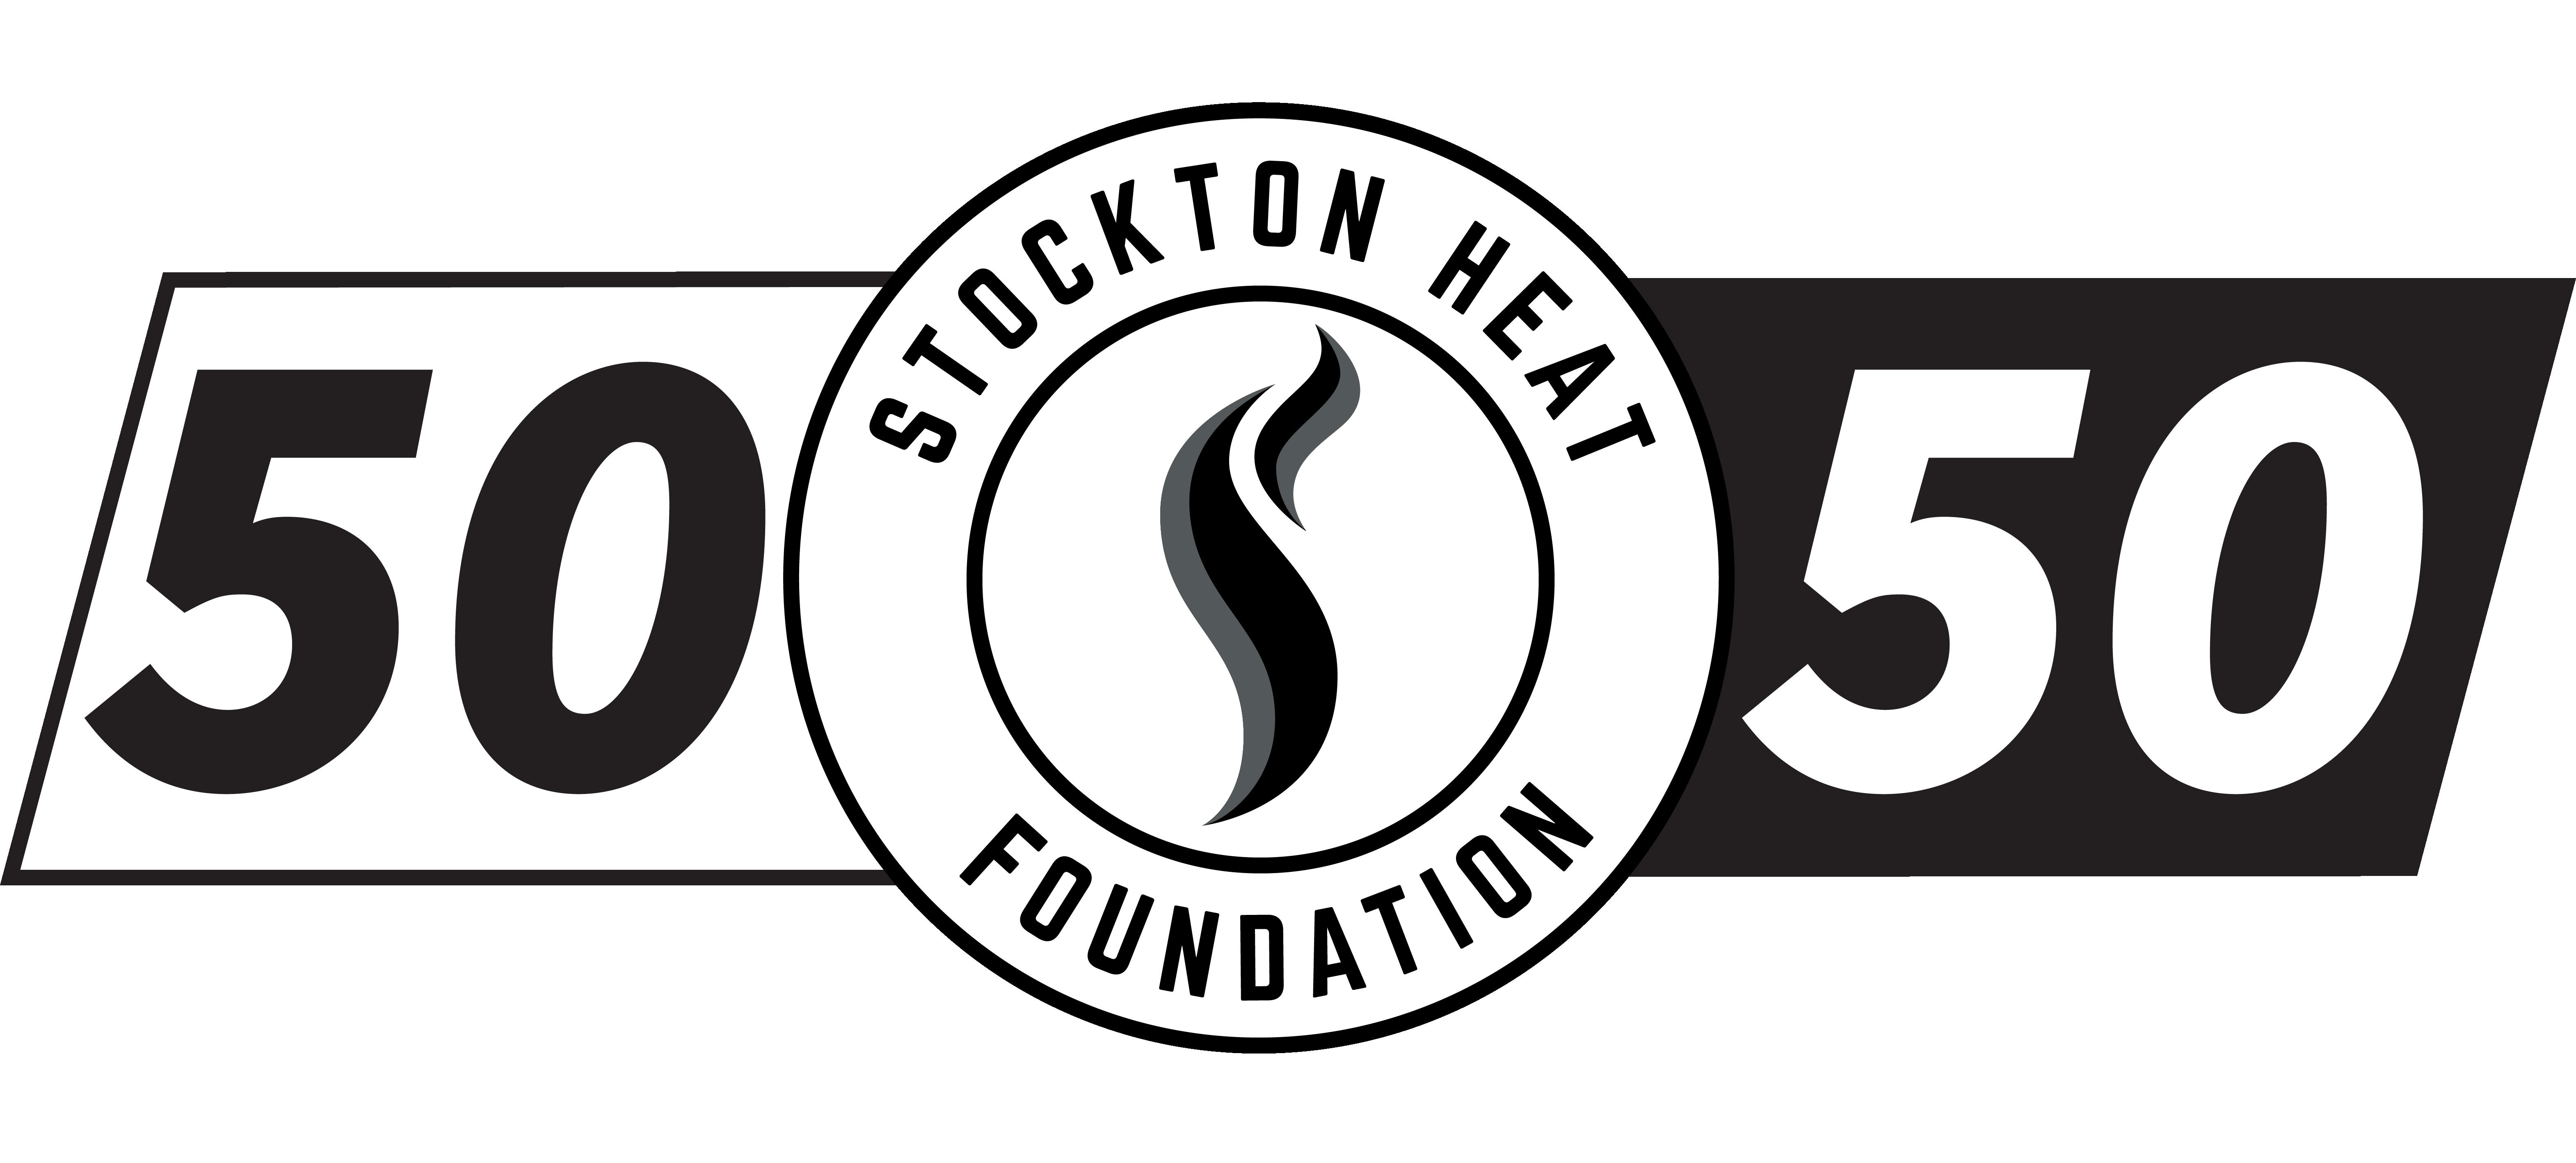 Stocktonheat com. Raffle clipart game ticket